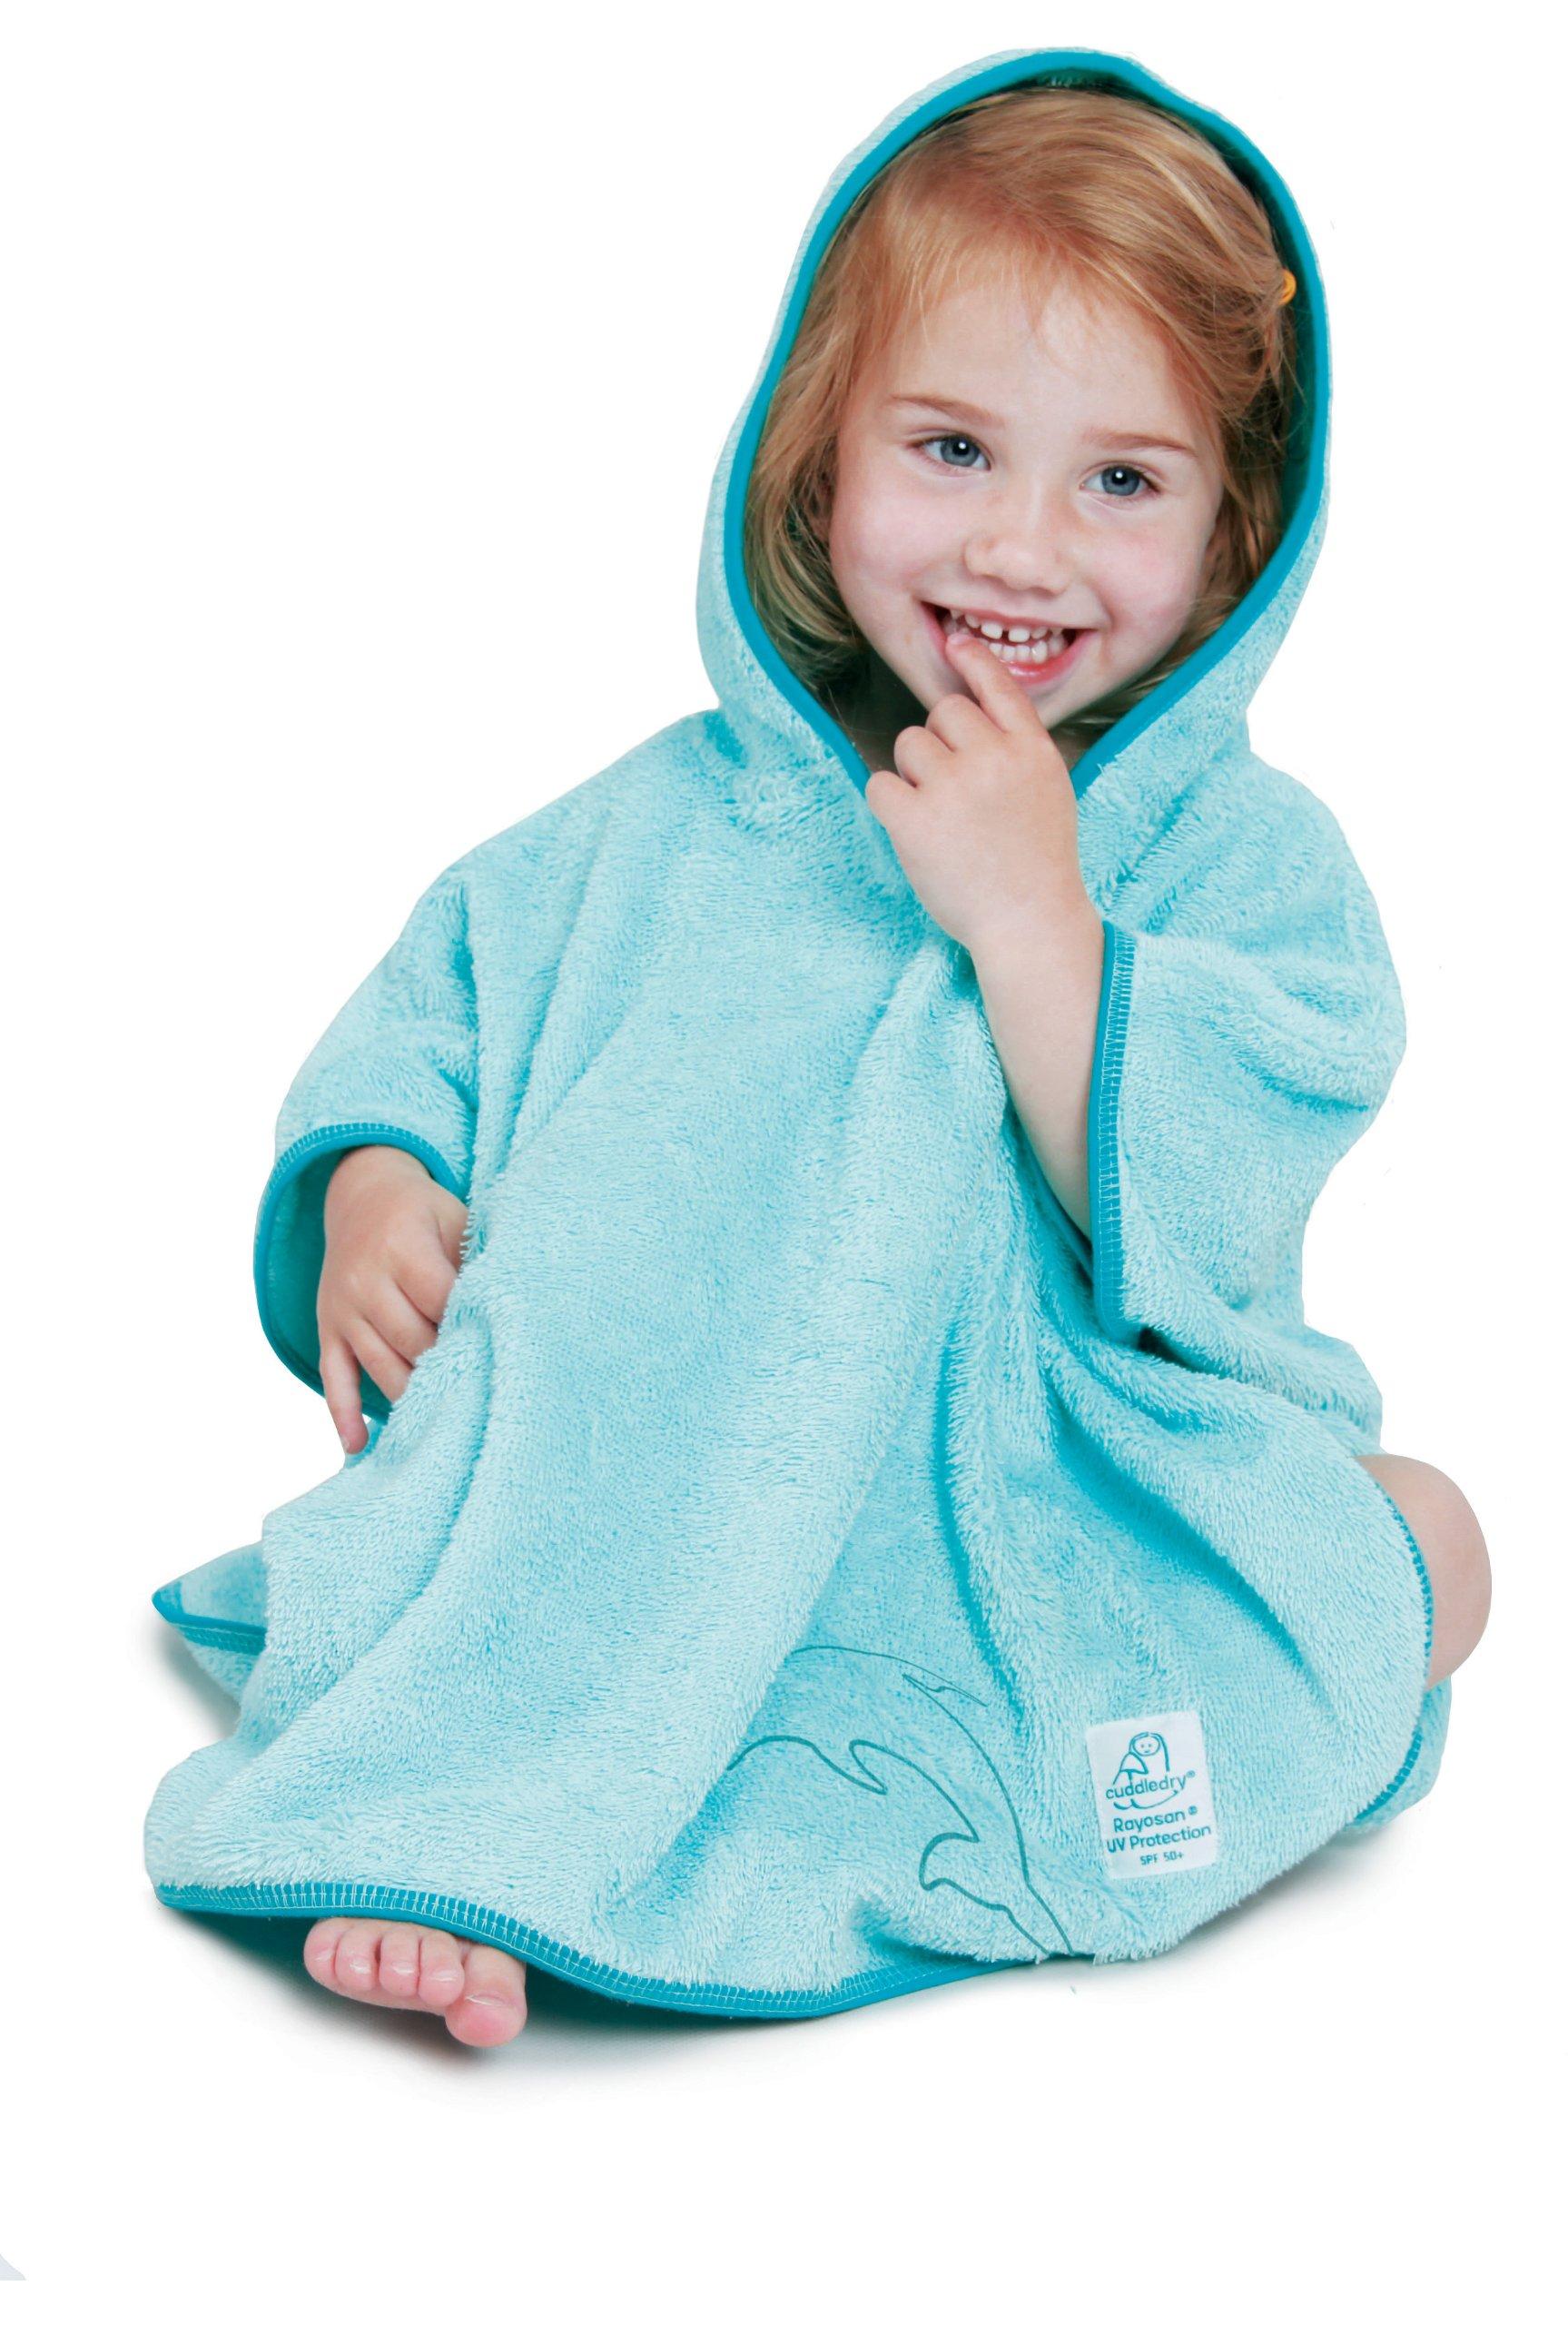 Snuggledry SPF 50+ UV Poncho Towel, Blue by Snuggledry